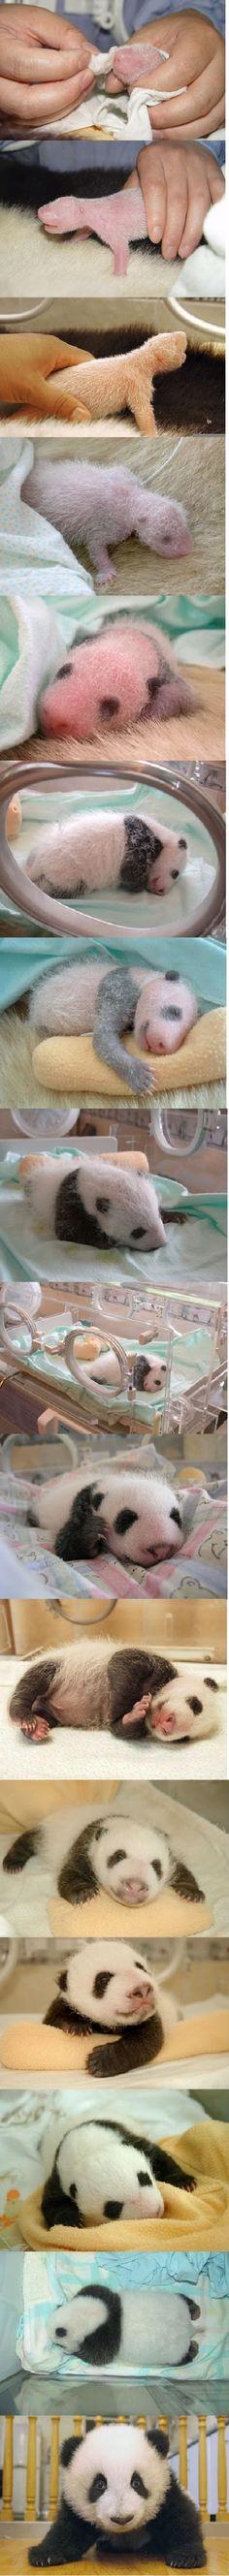 Incredible journey in the development of the baby panda!실시간바카라실시간바카라실시간바카라실시간바카라실시간바카라실시간바카라실시간바카라실시간바카라실시간바카라